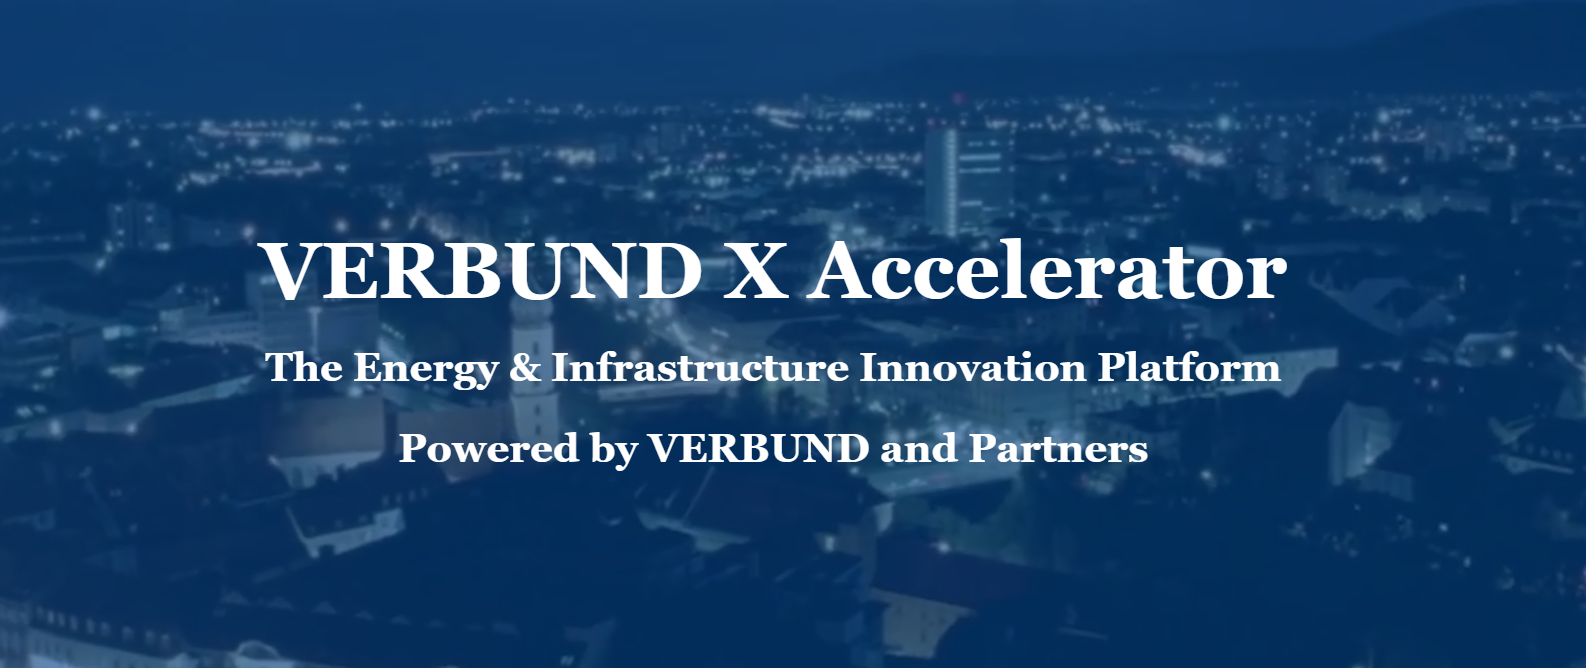 VERBUND X Accelerator